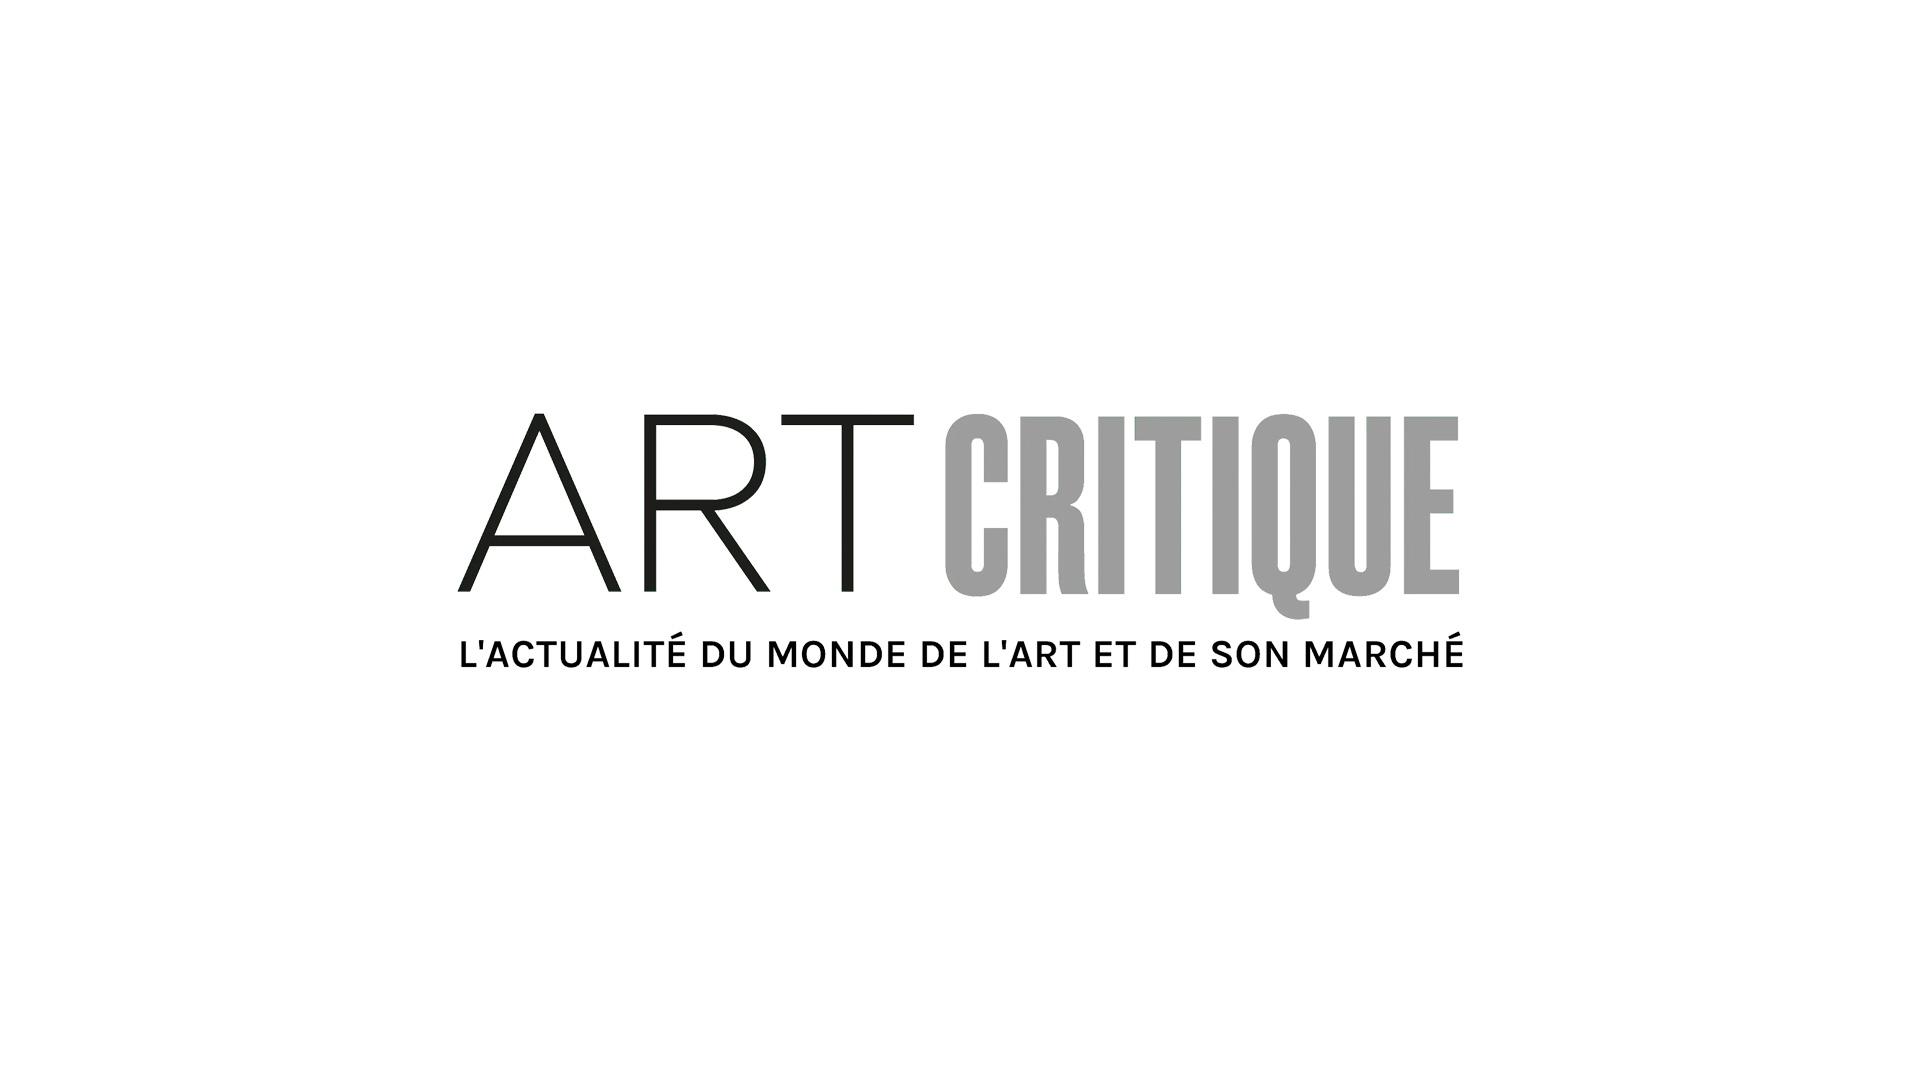 Nan Goldin denounces the Sackler settlement giving plaintiffs $10 billion